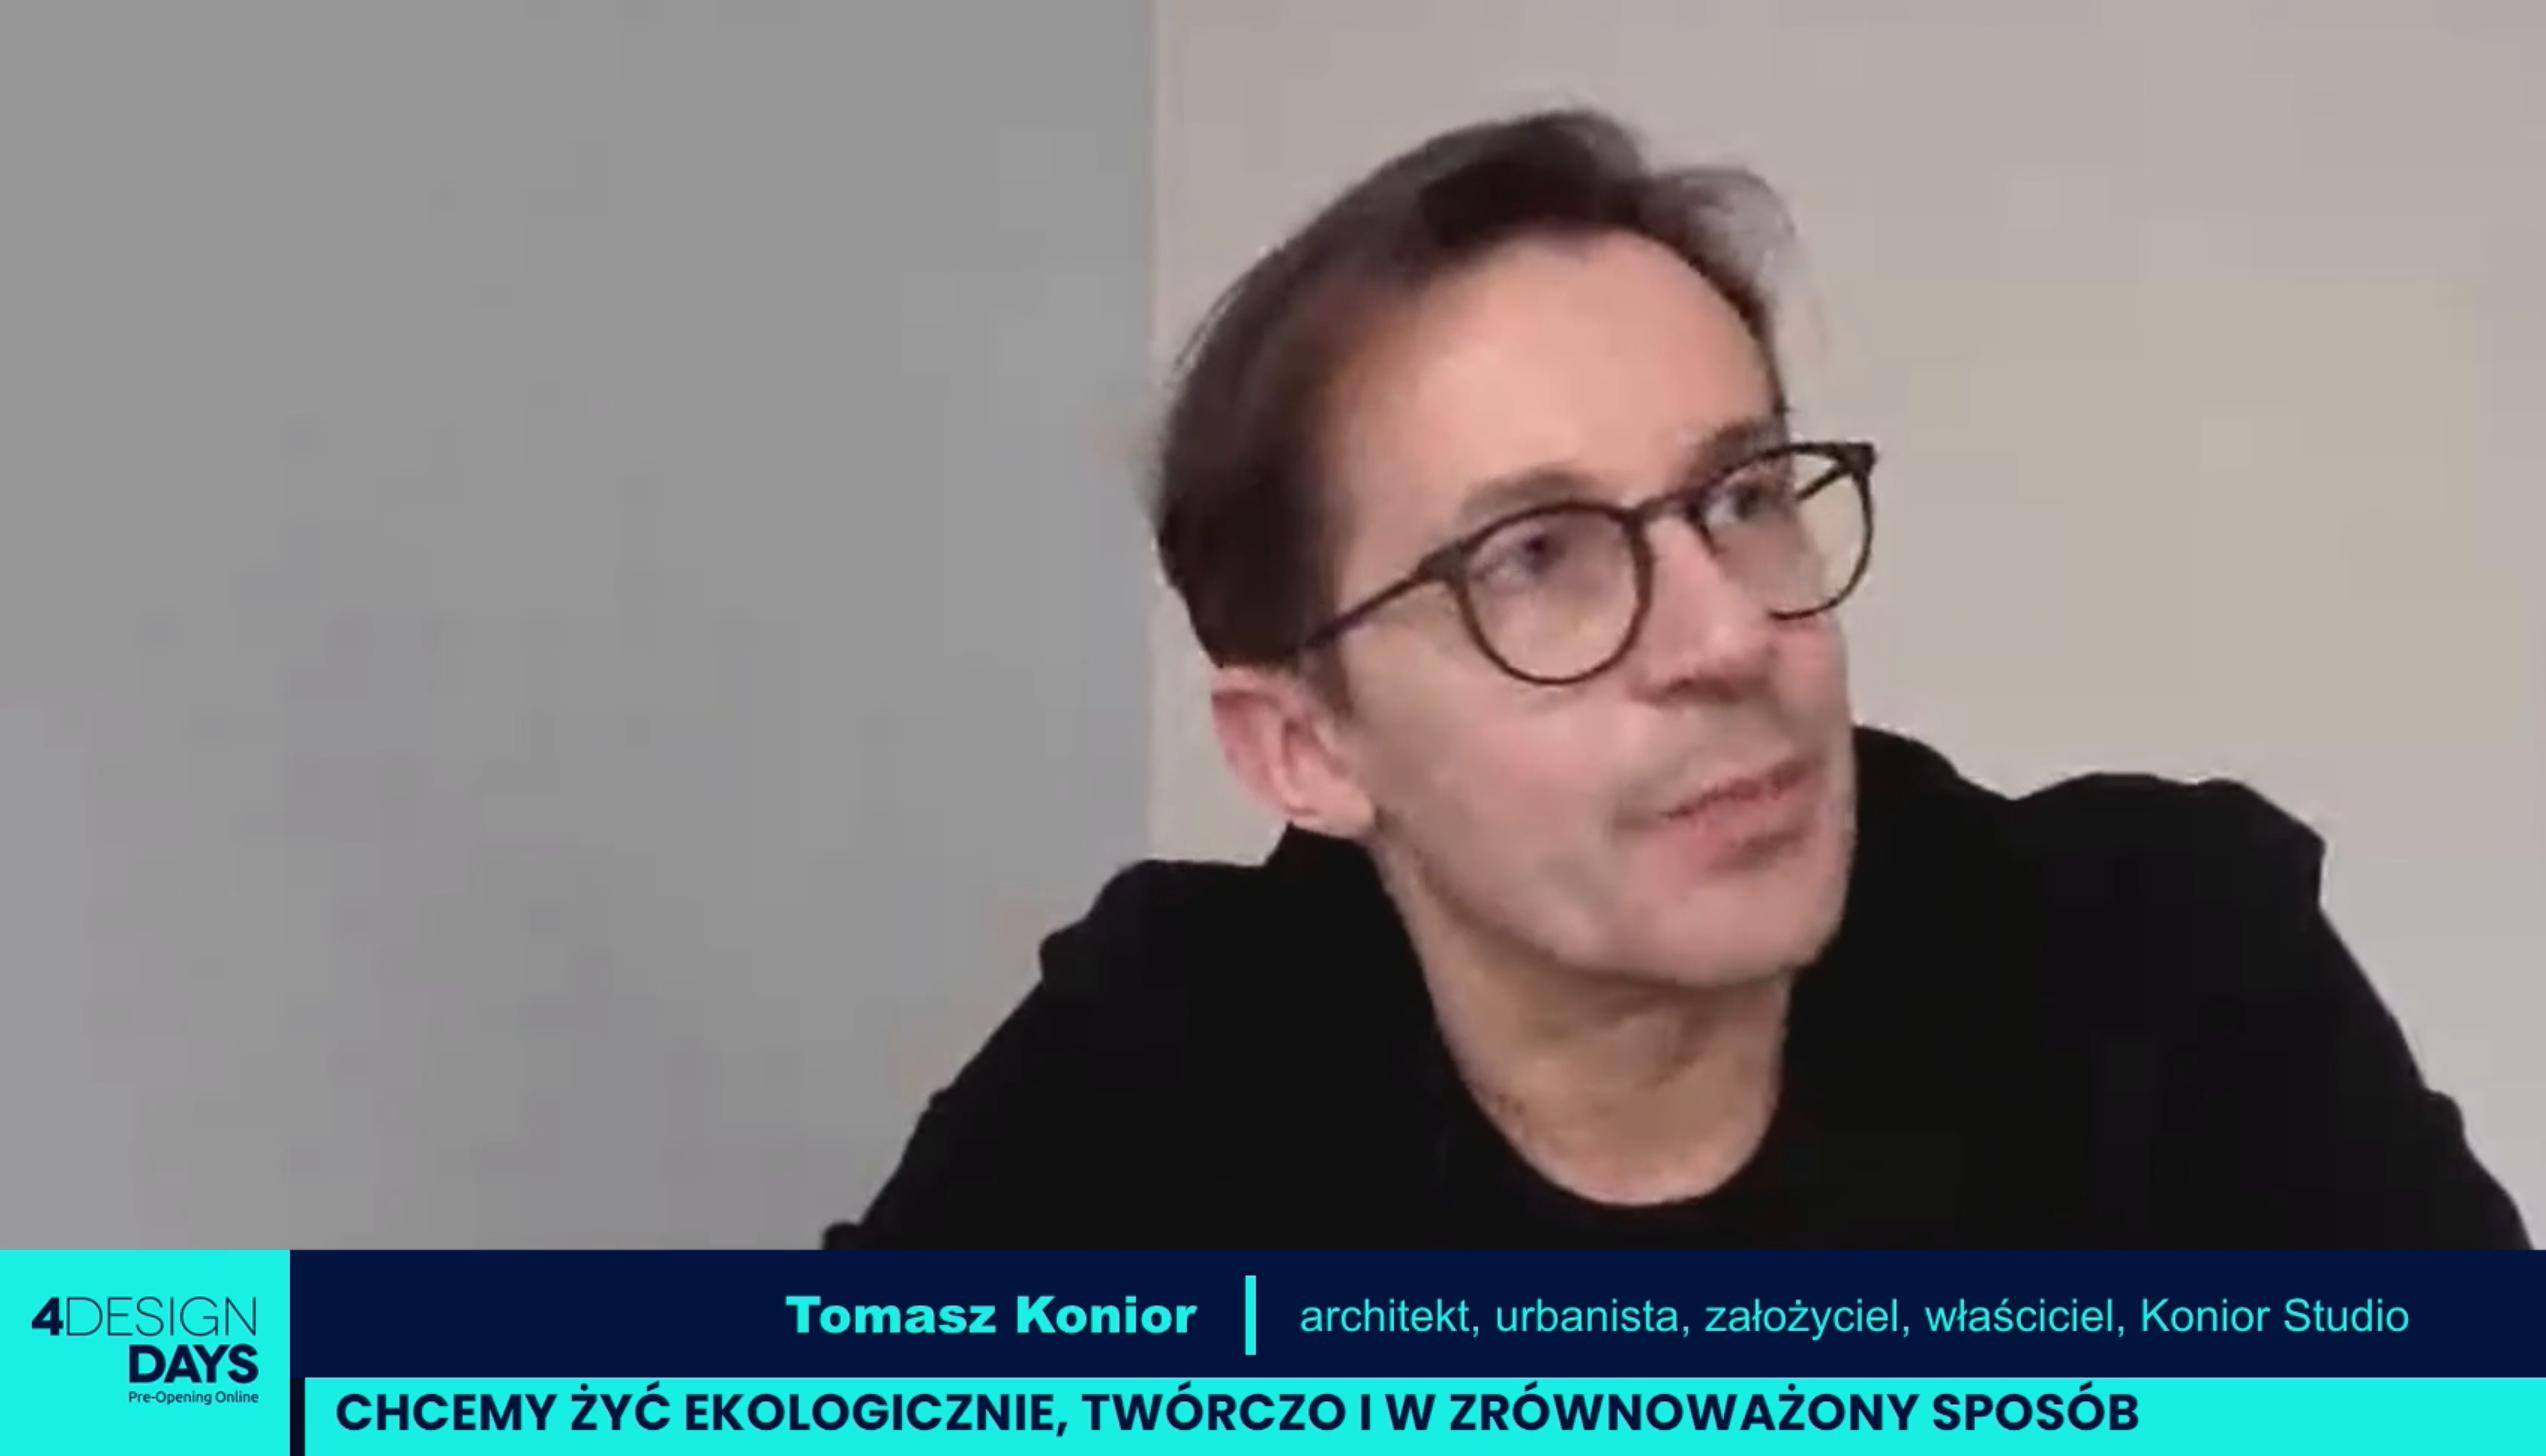 Tomasz Konior